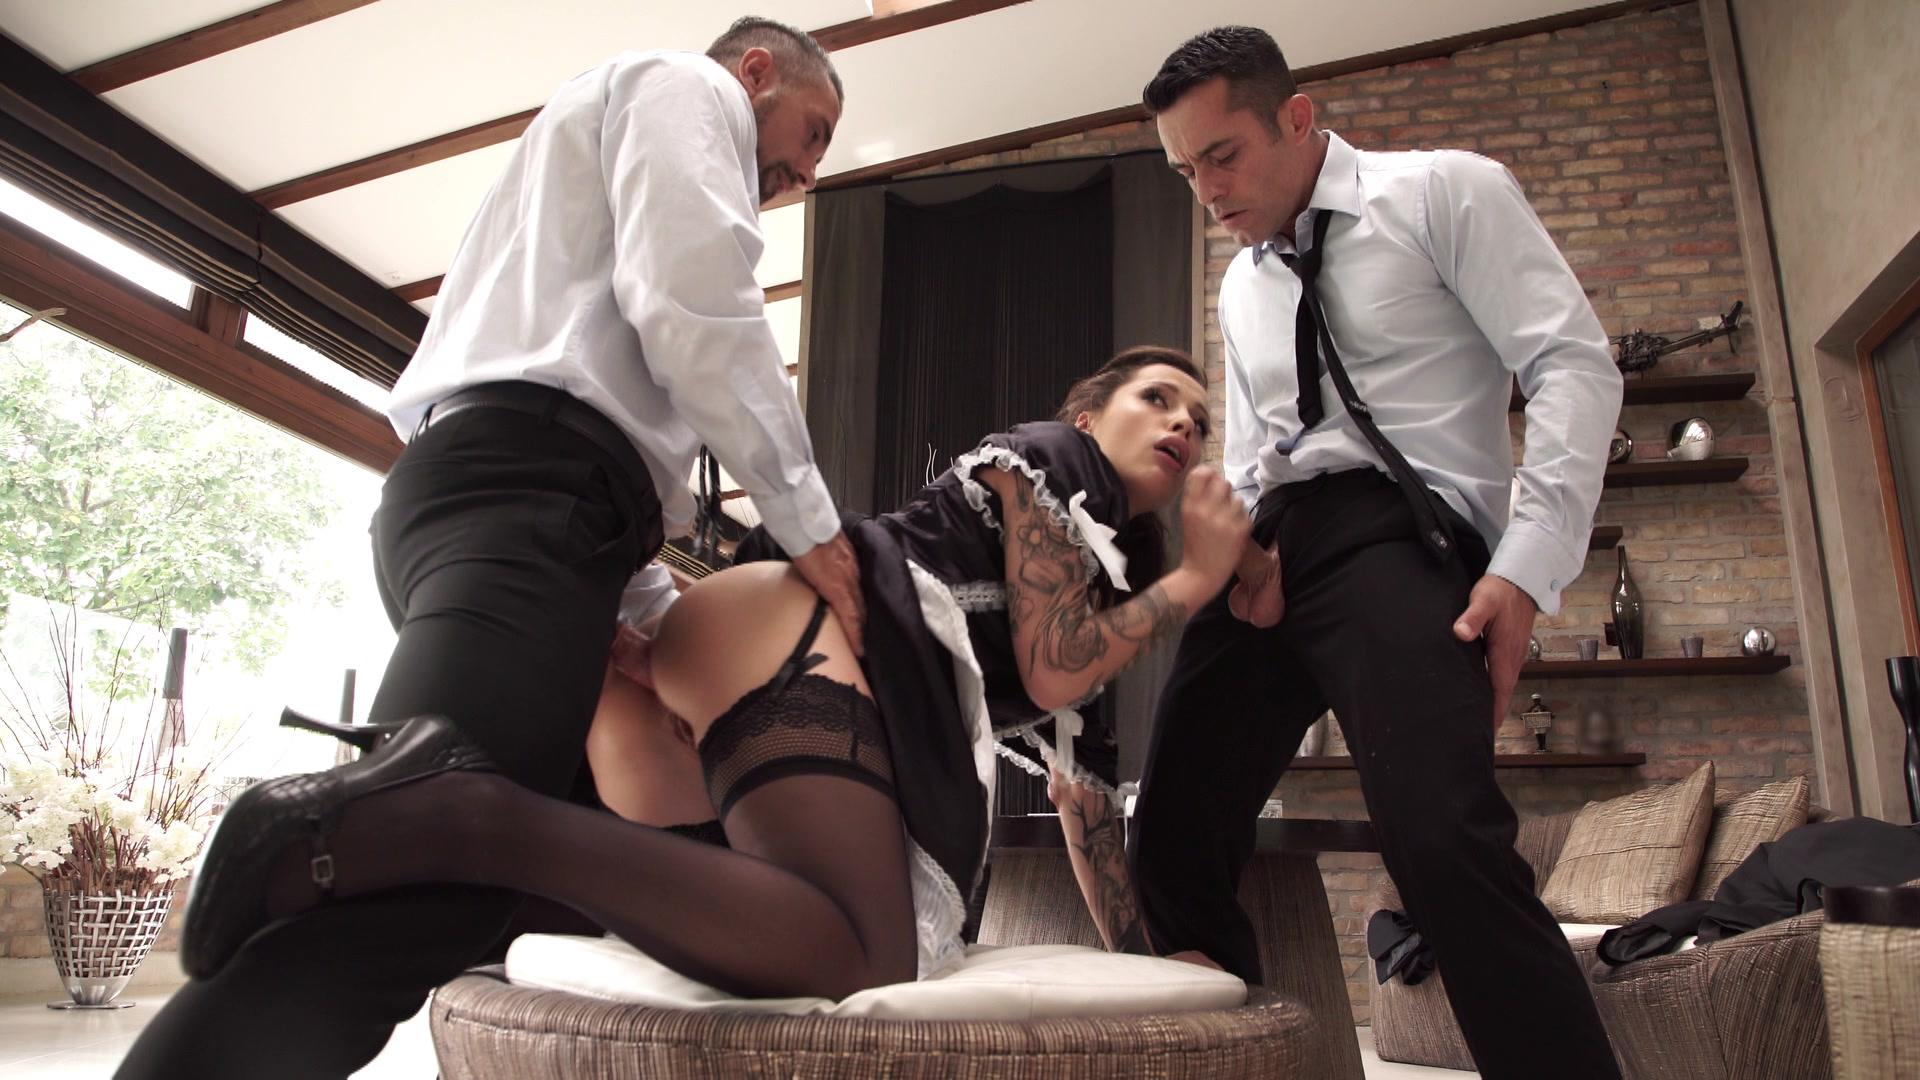 Maid fucked by boss porn pics